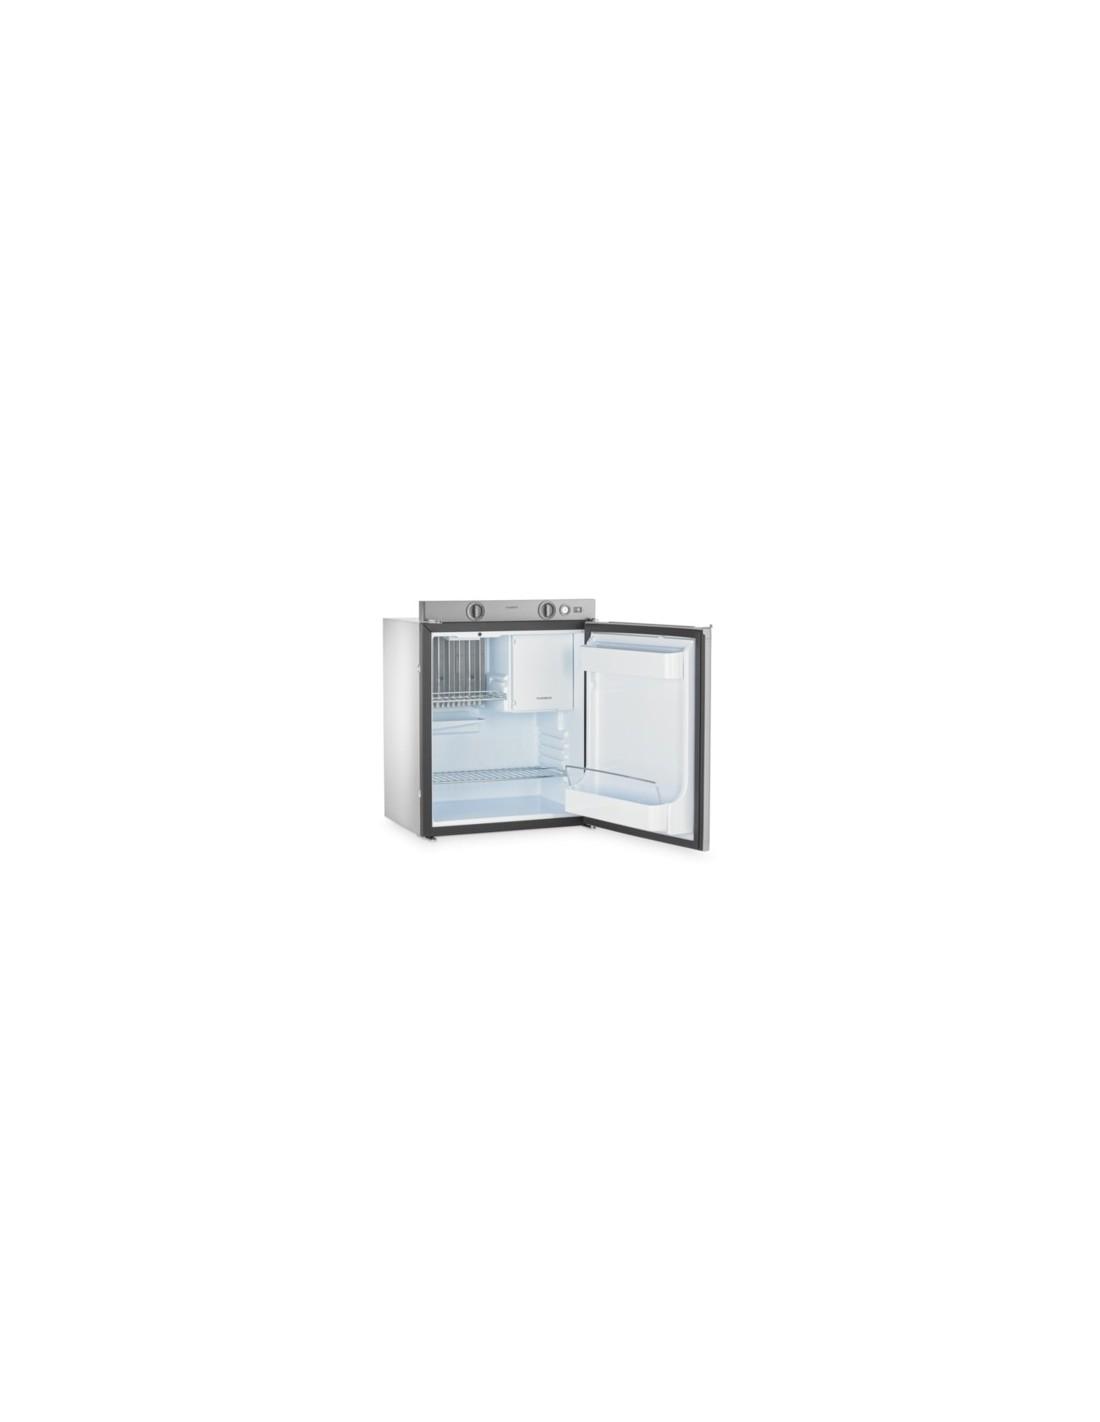 Dometic RM 5310 Absorber-kühlschrank 60l - Jundi Camping